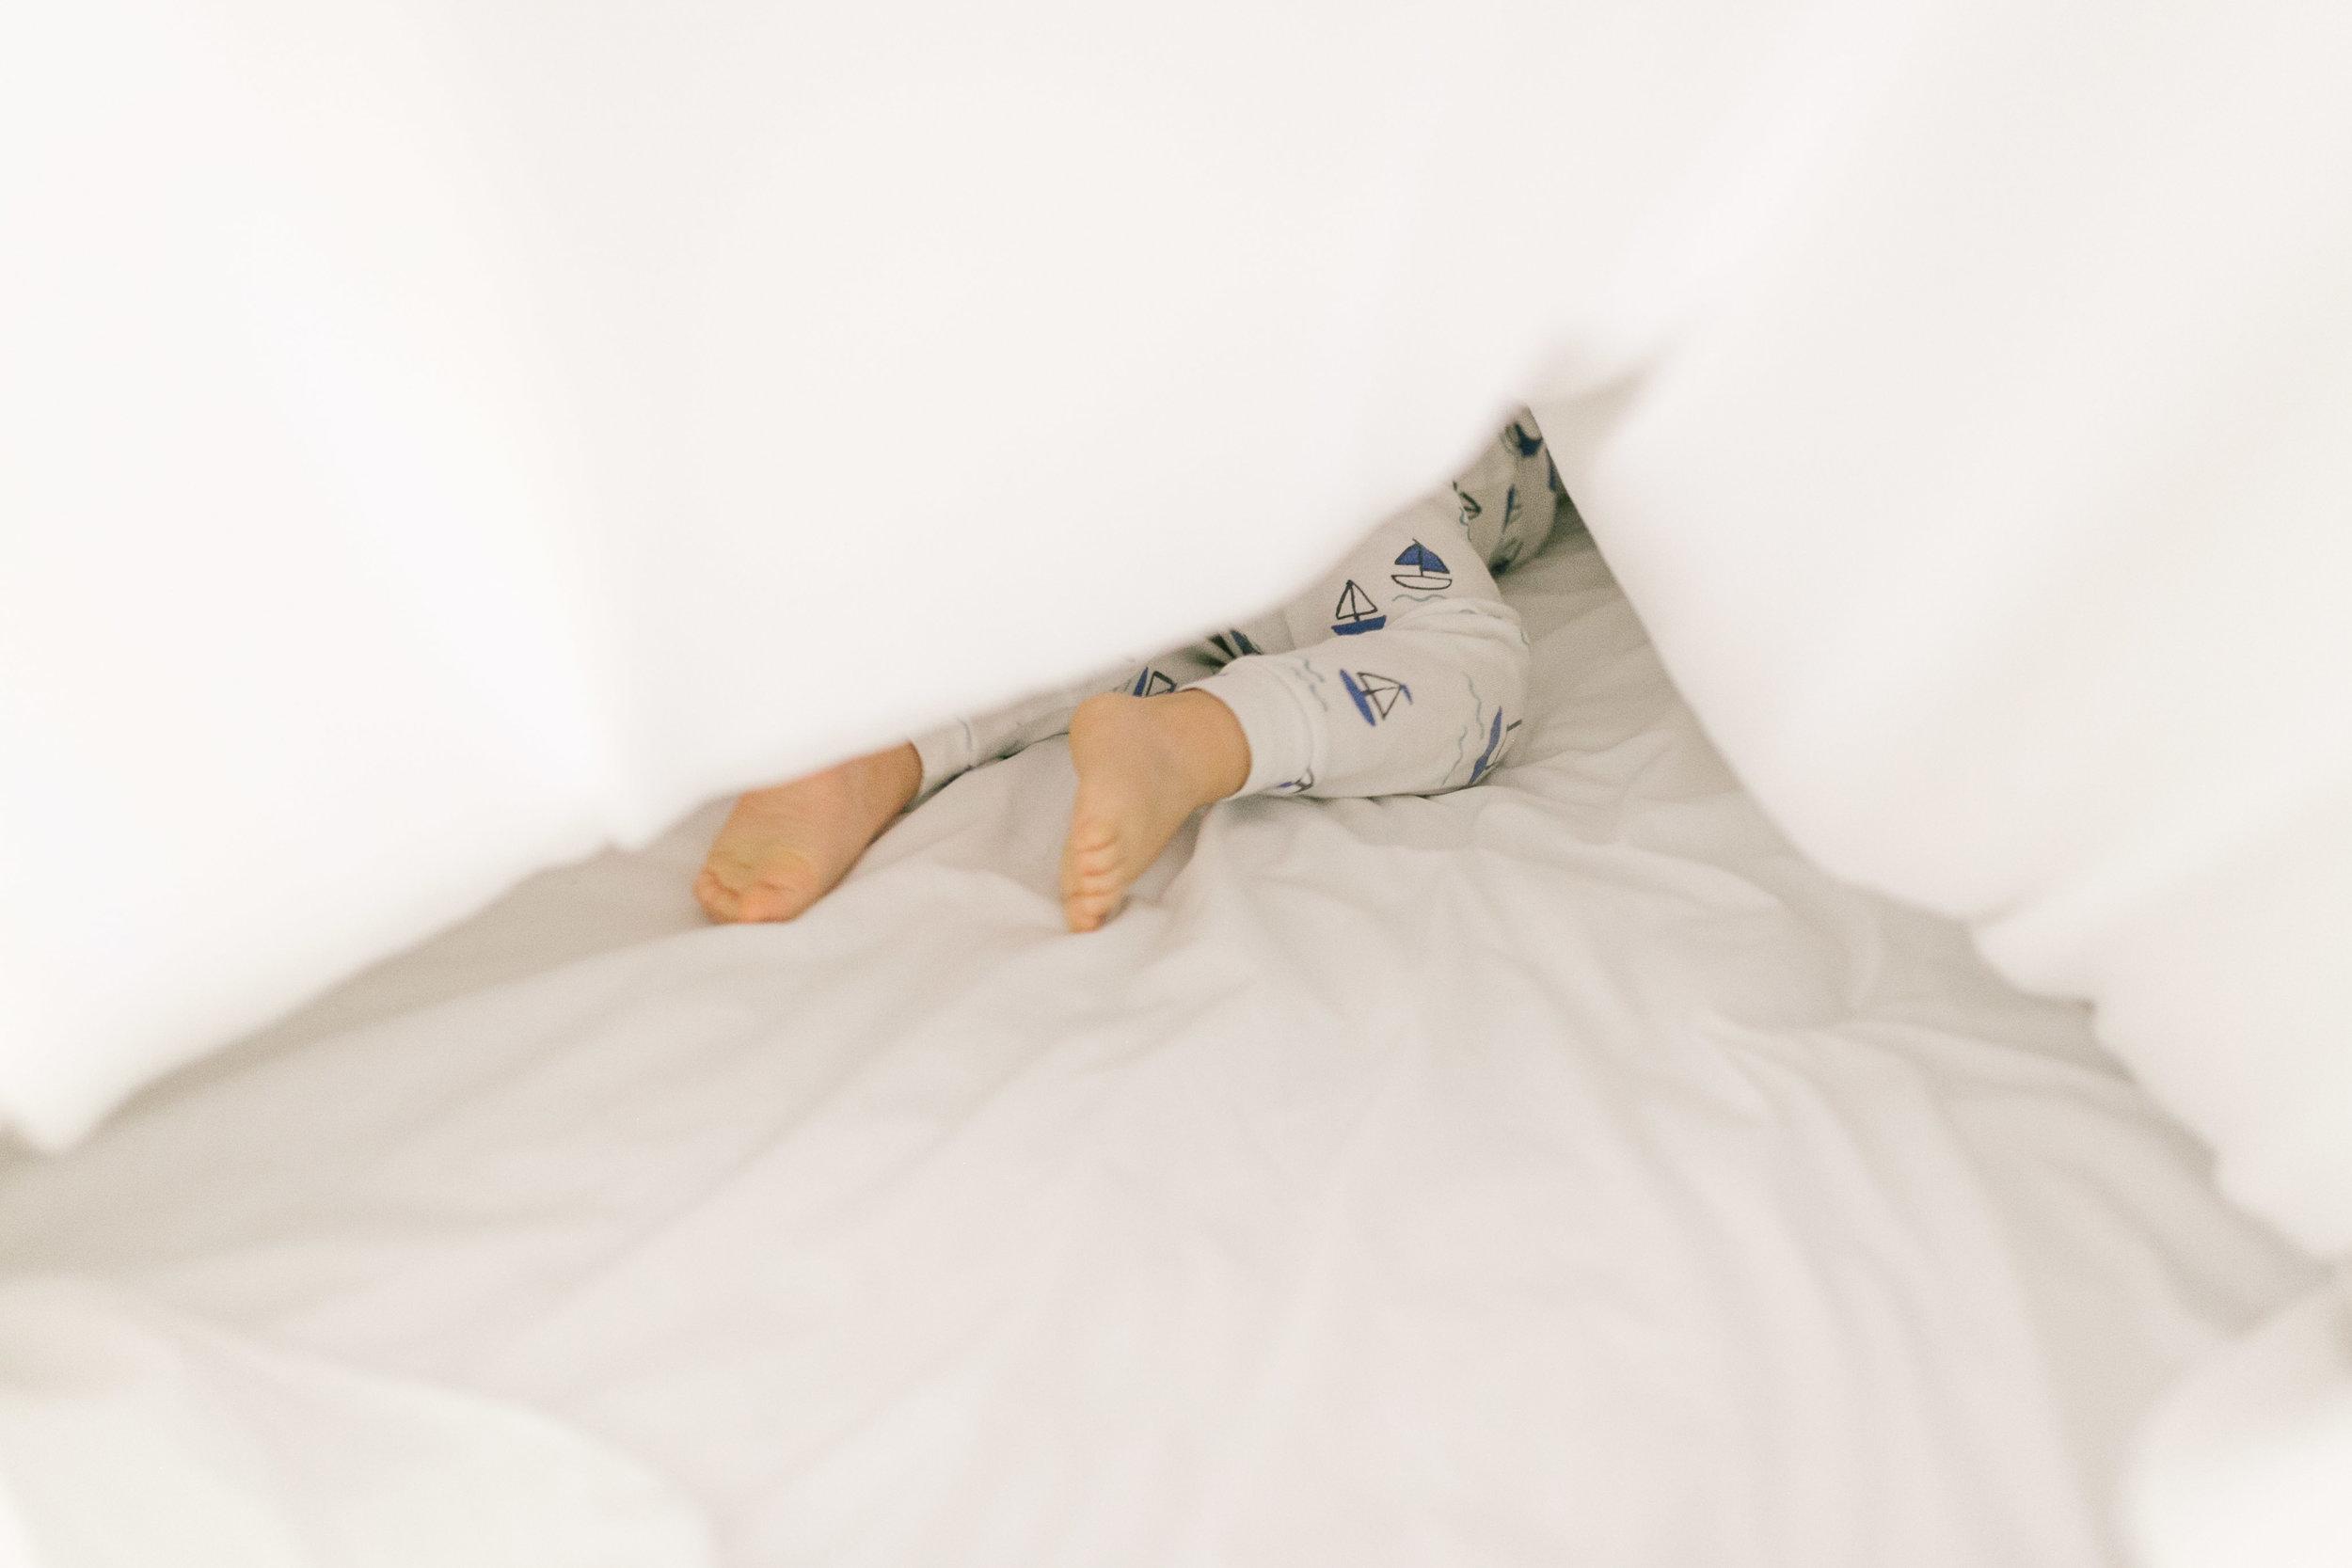 Playful toddler lifestyle portraits, documentary style photography | Chelsea Macor Photography-6.jpg